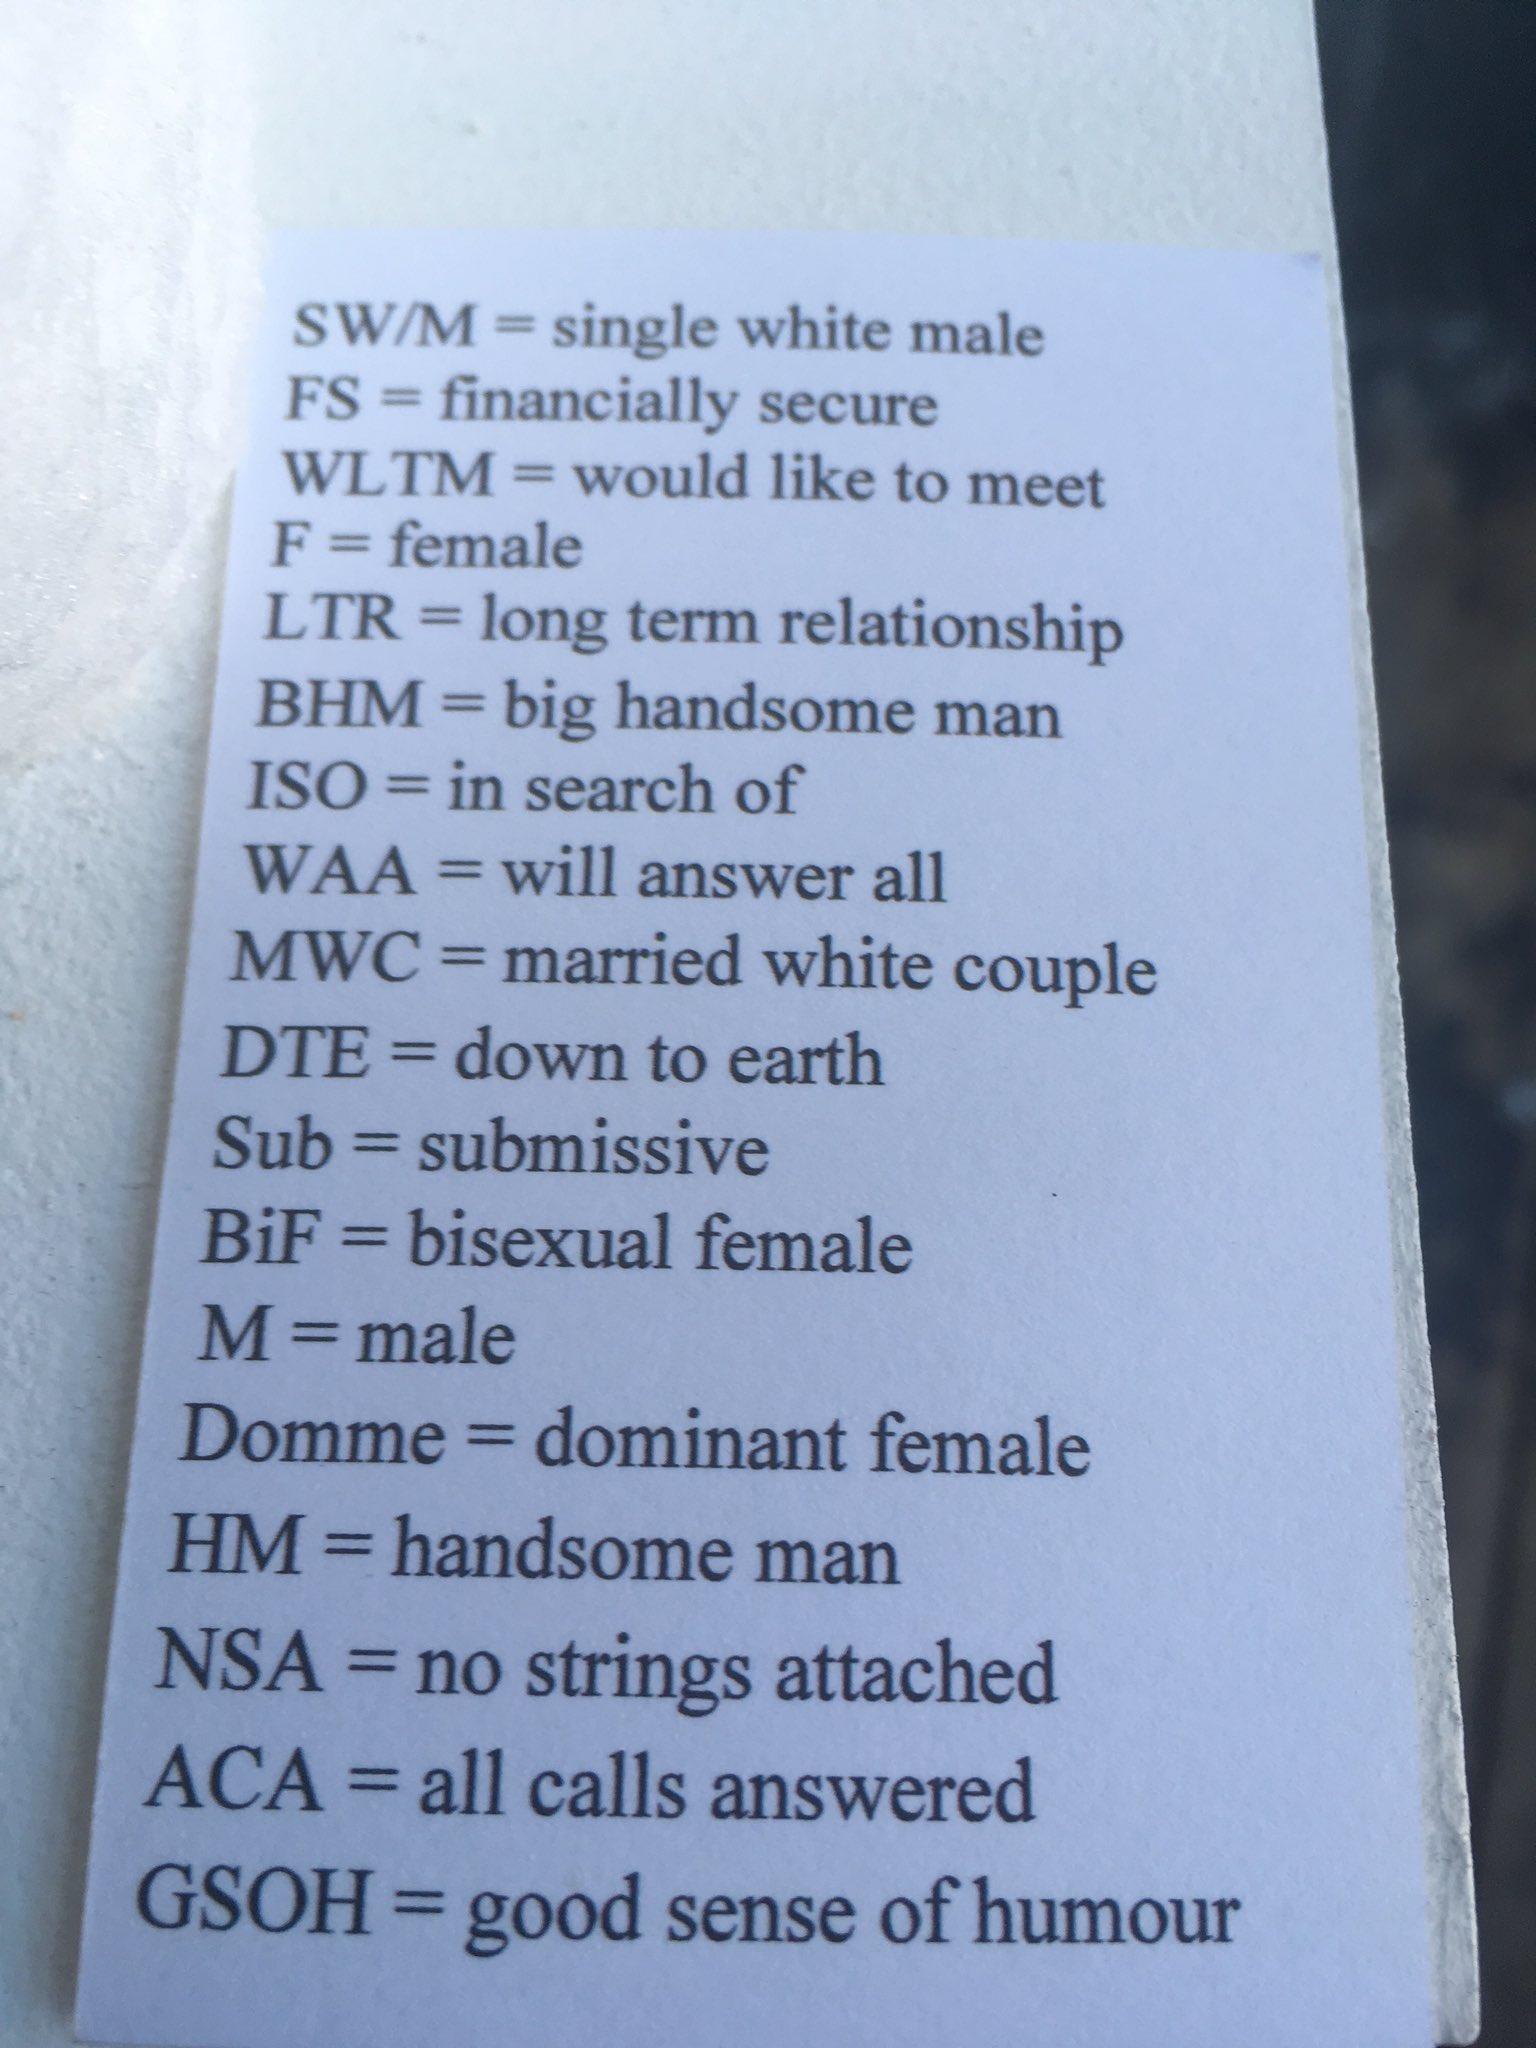 Aca acronym dating is interracial dating still taboo